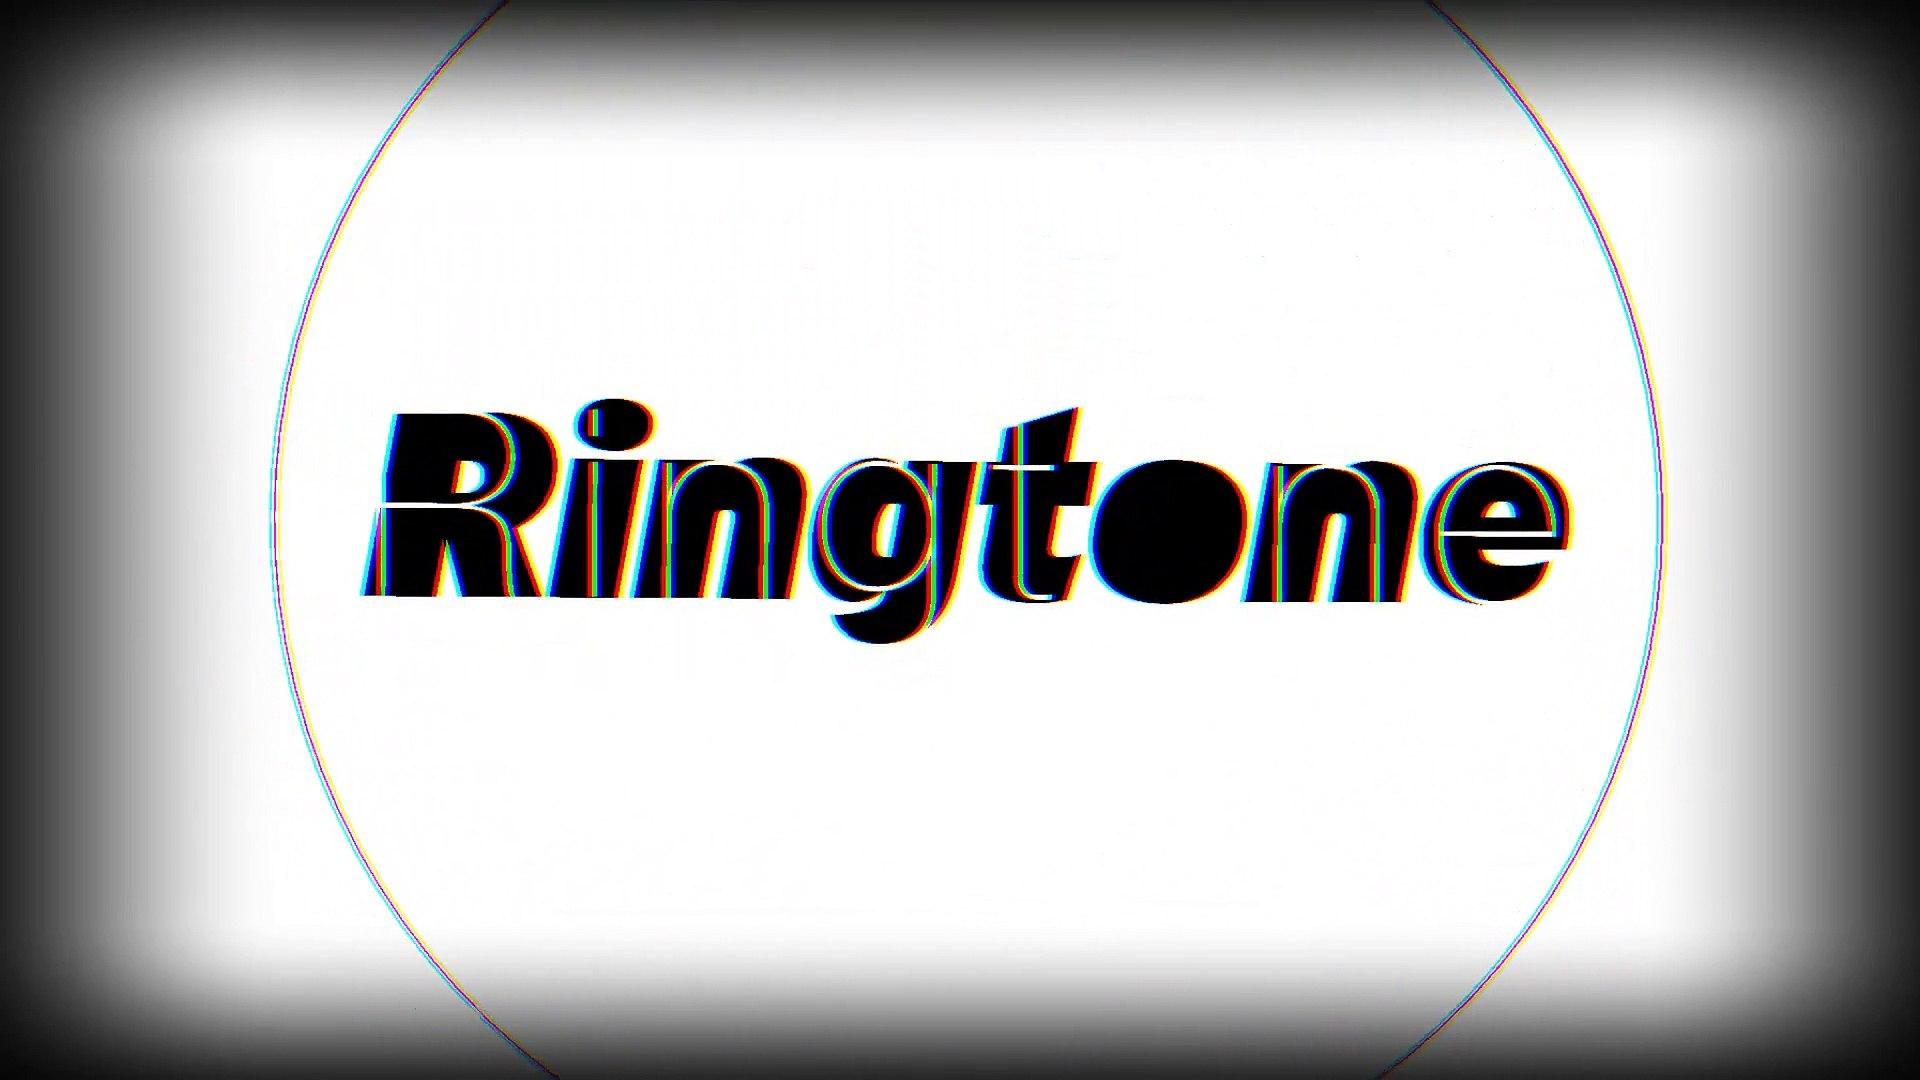 iPhone X Ringtone Remix ( Ringtone download link in description)